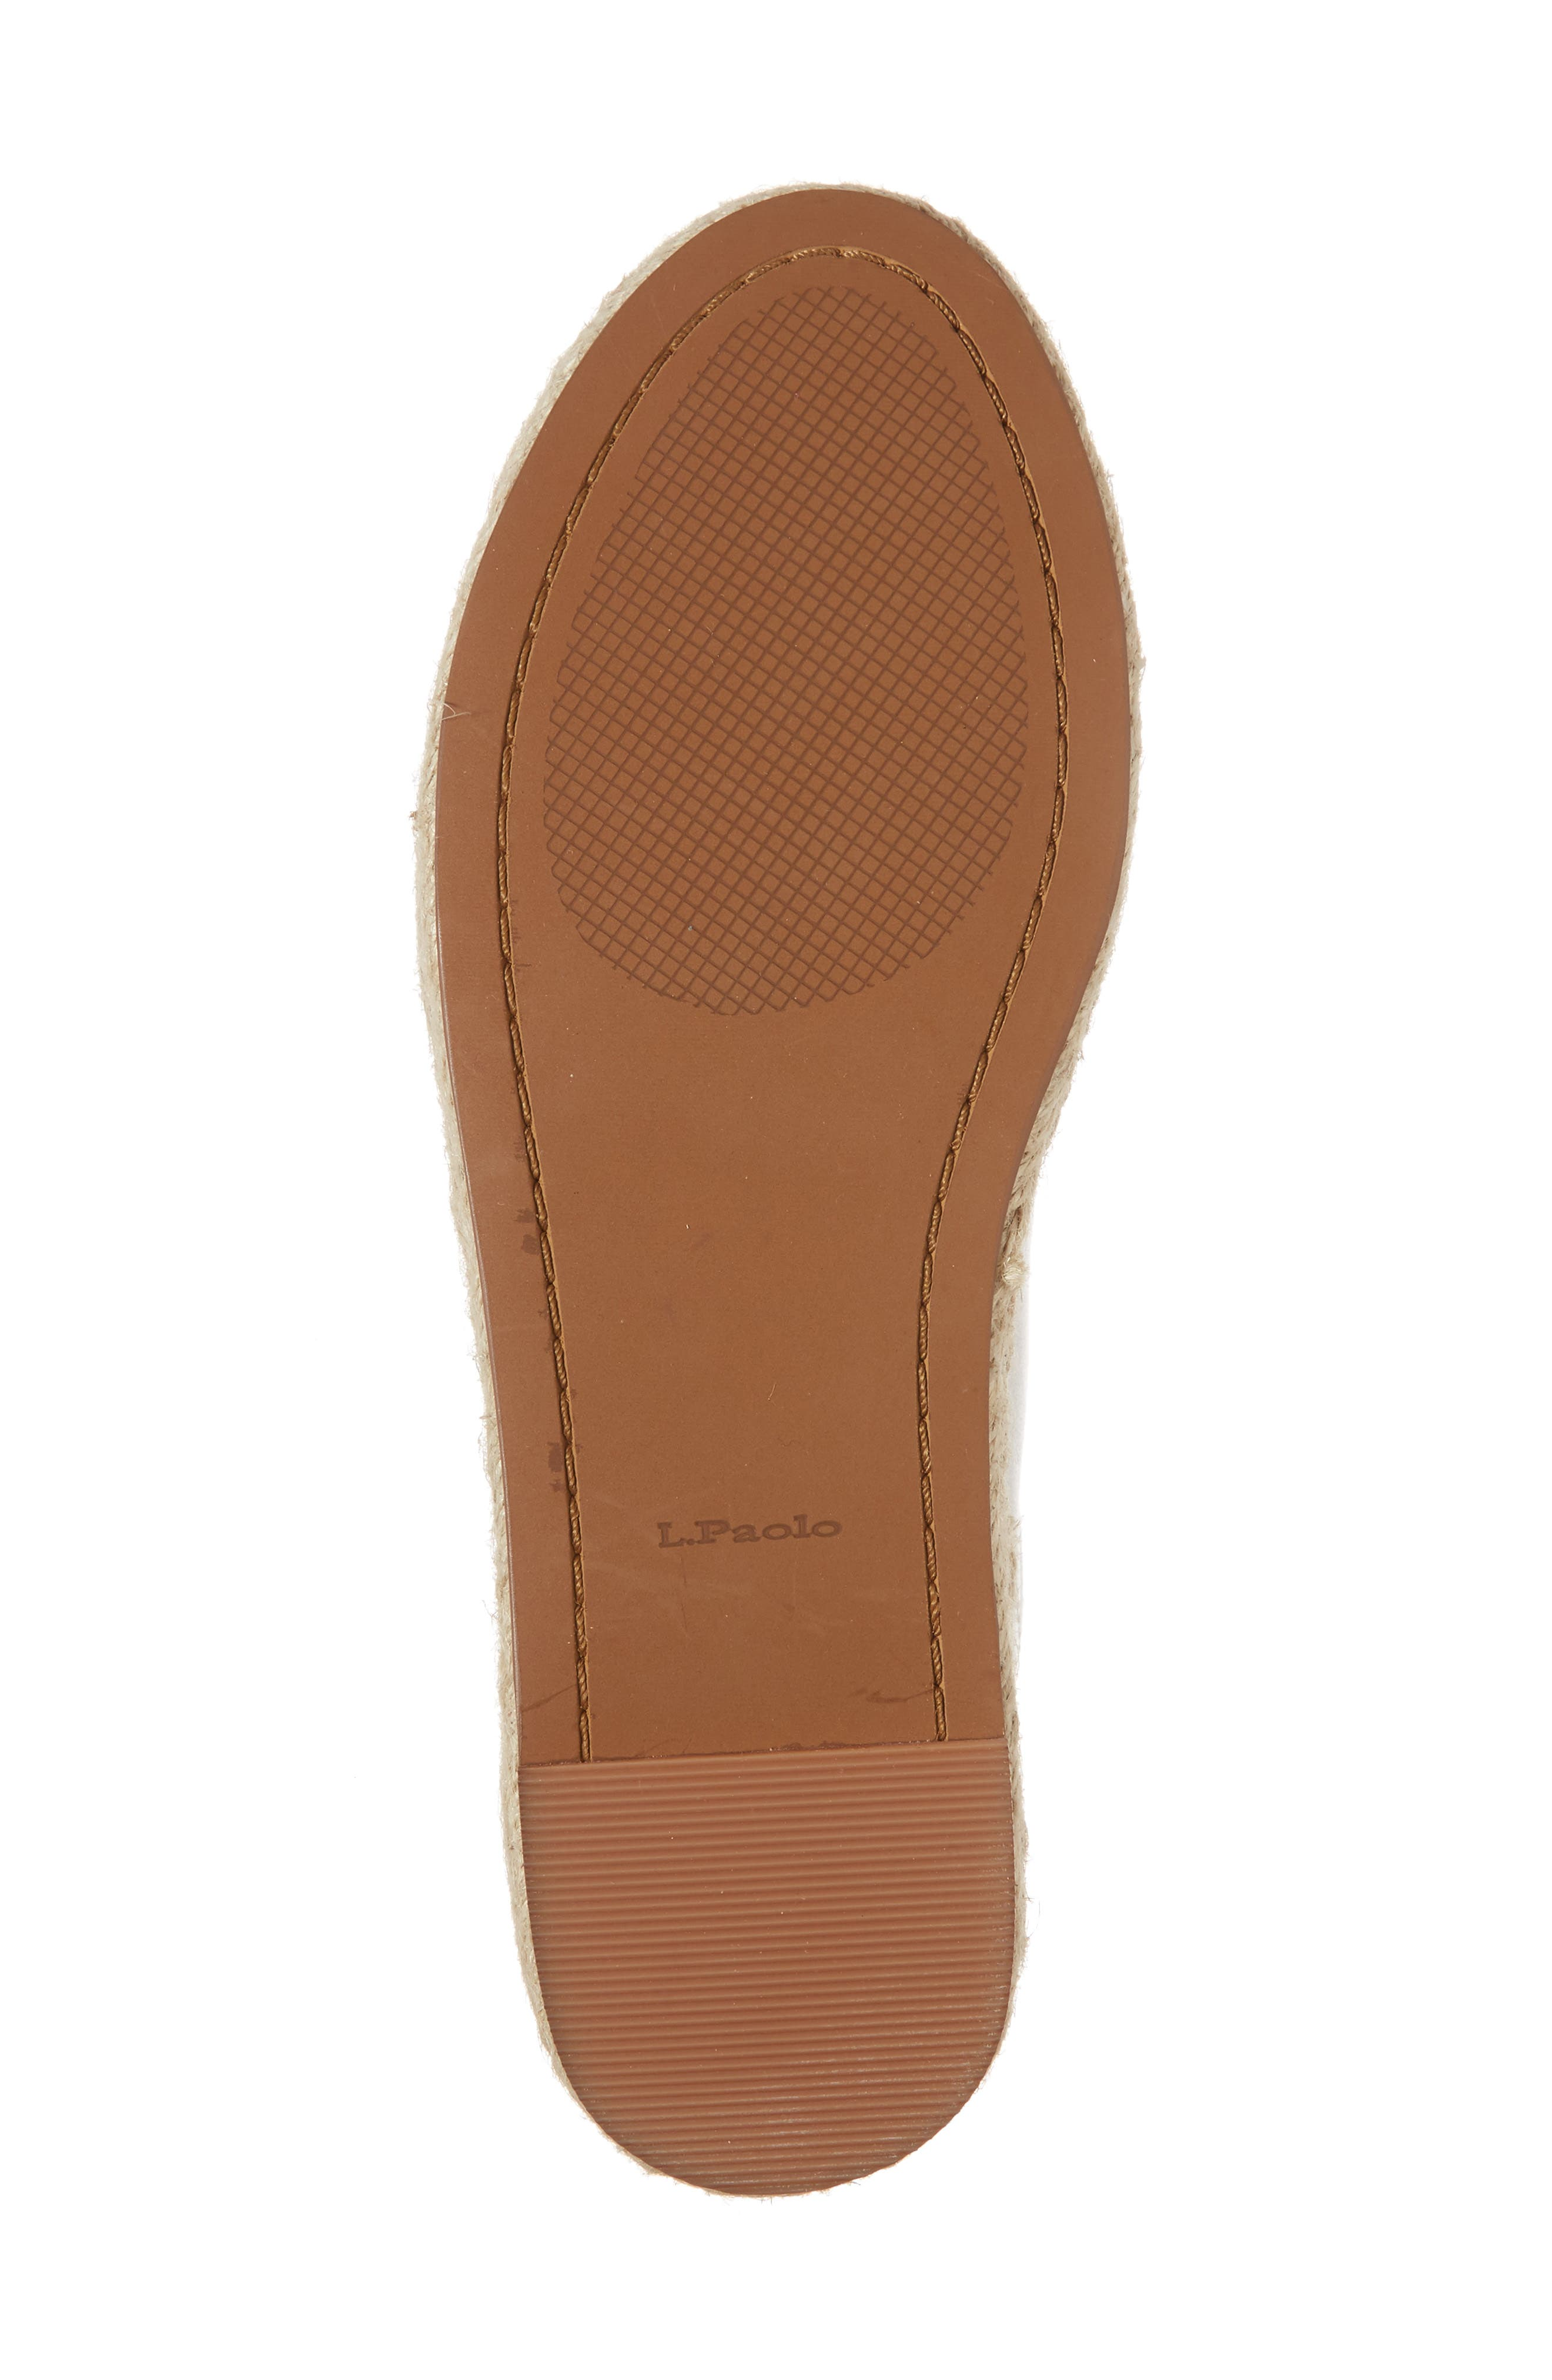 Sierra Espadrille Platform Sneaker,                             Alternate thumbnail 6, color,                             108